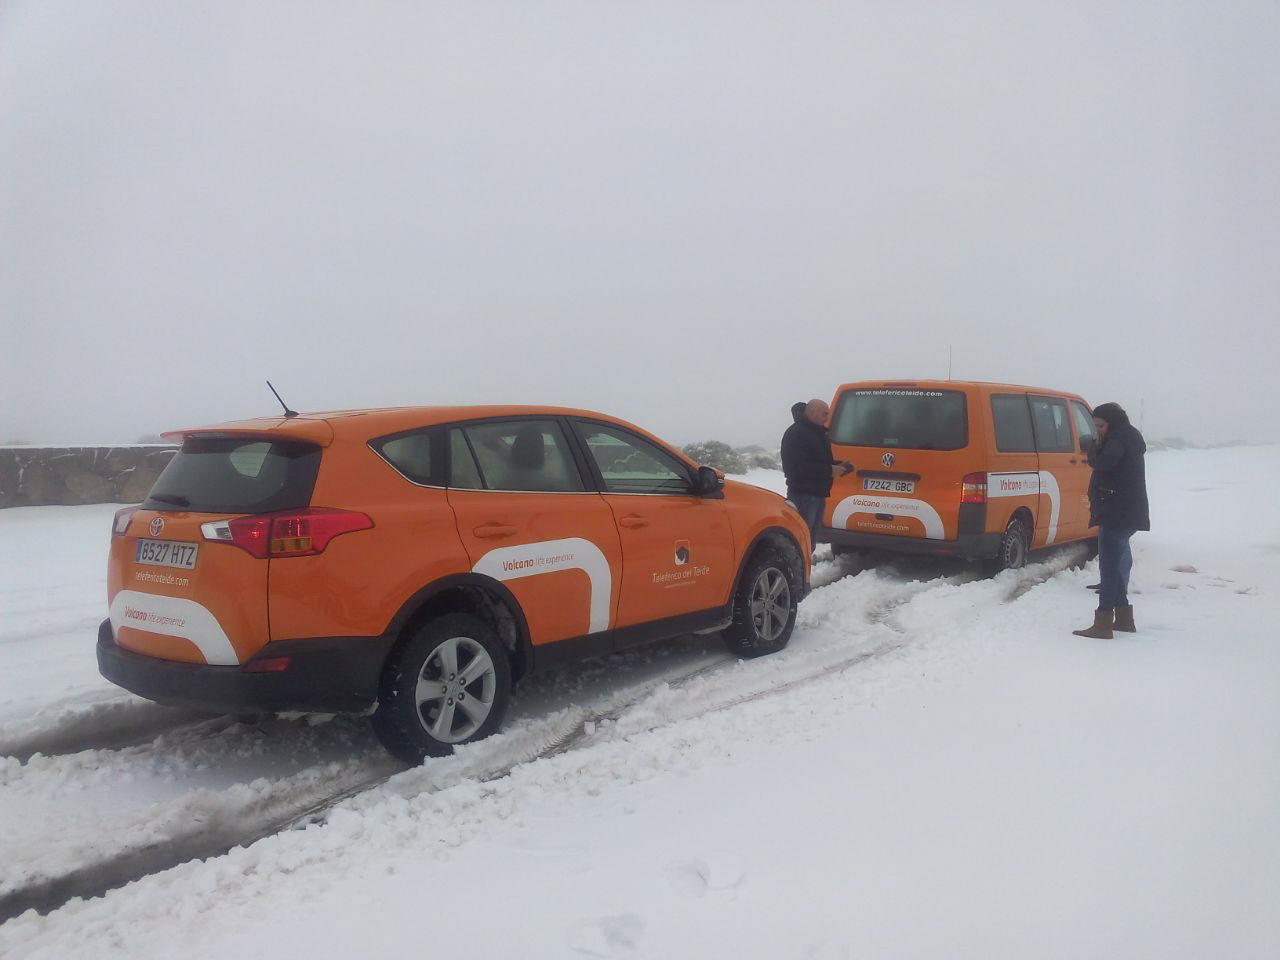 La primavera cubrió el Teide de nieve. | Teleférico